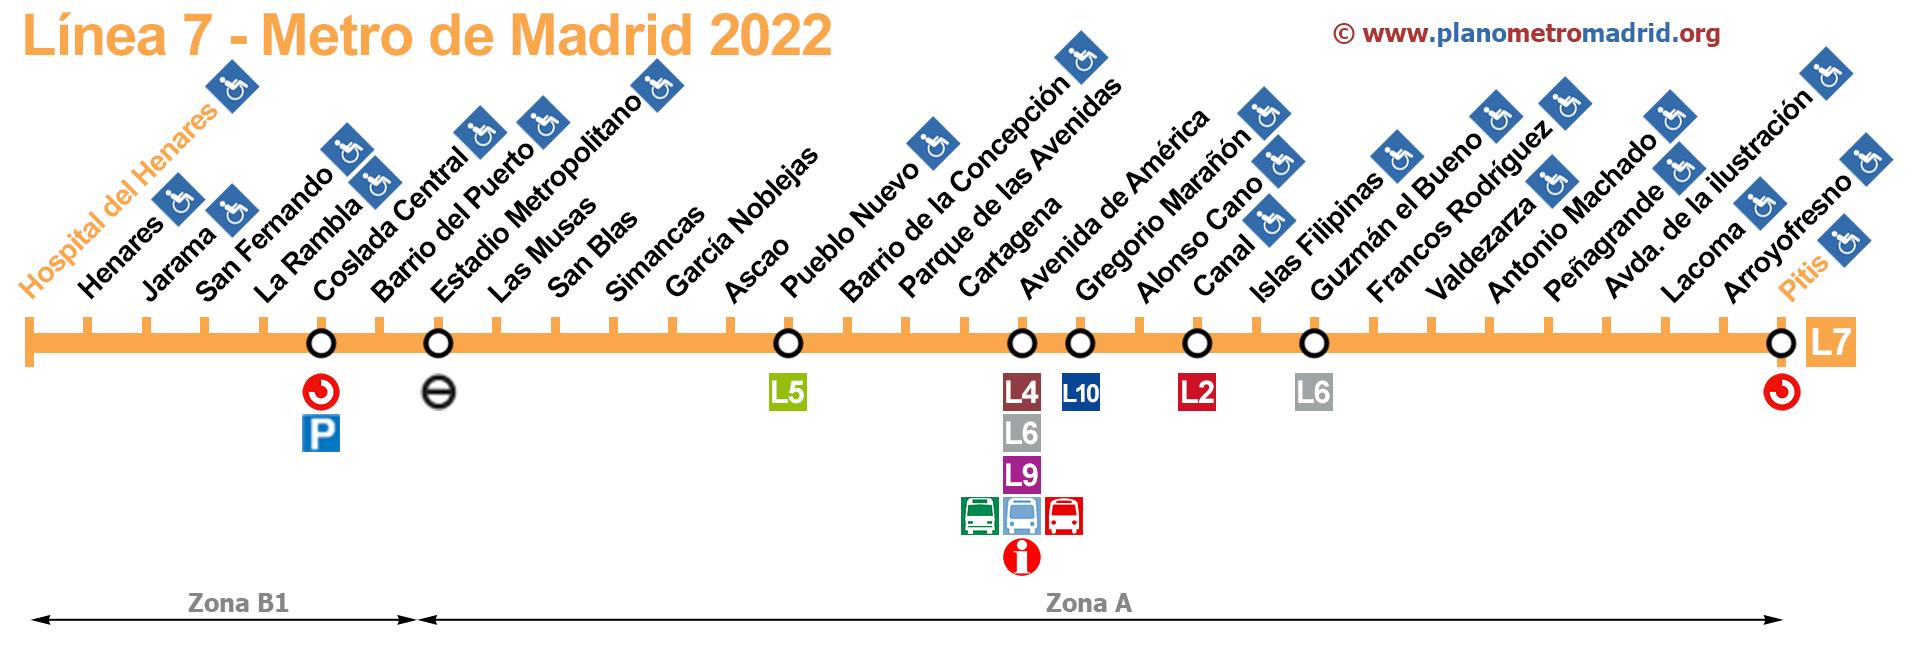 Lnea 7 del metro de Madrid L7 Actualizado 2017